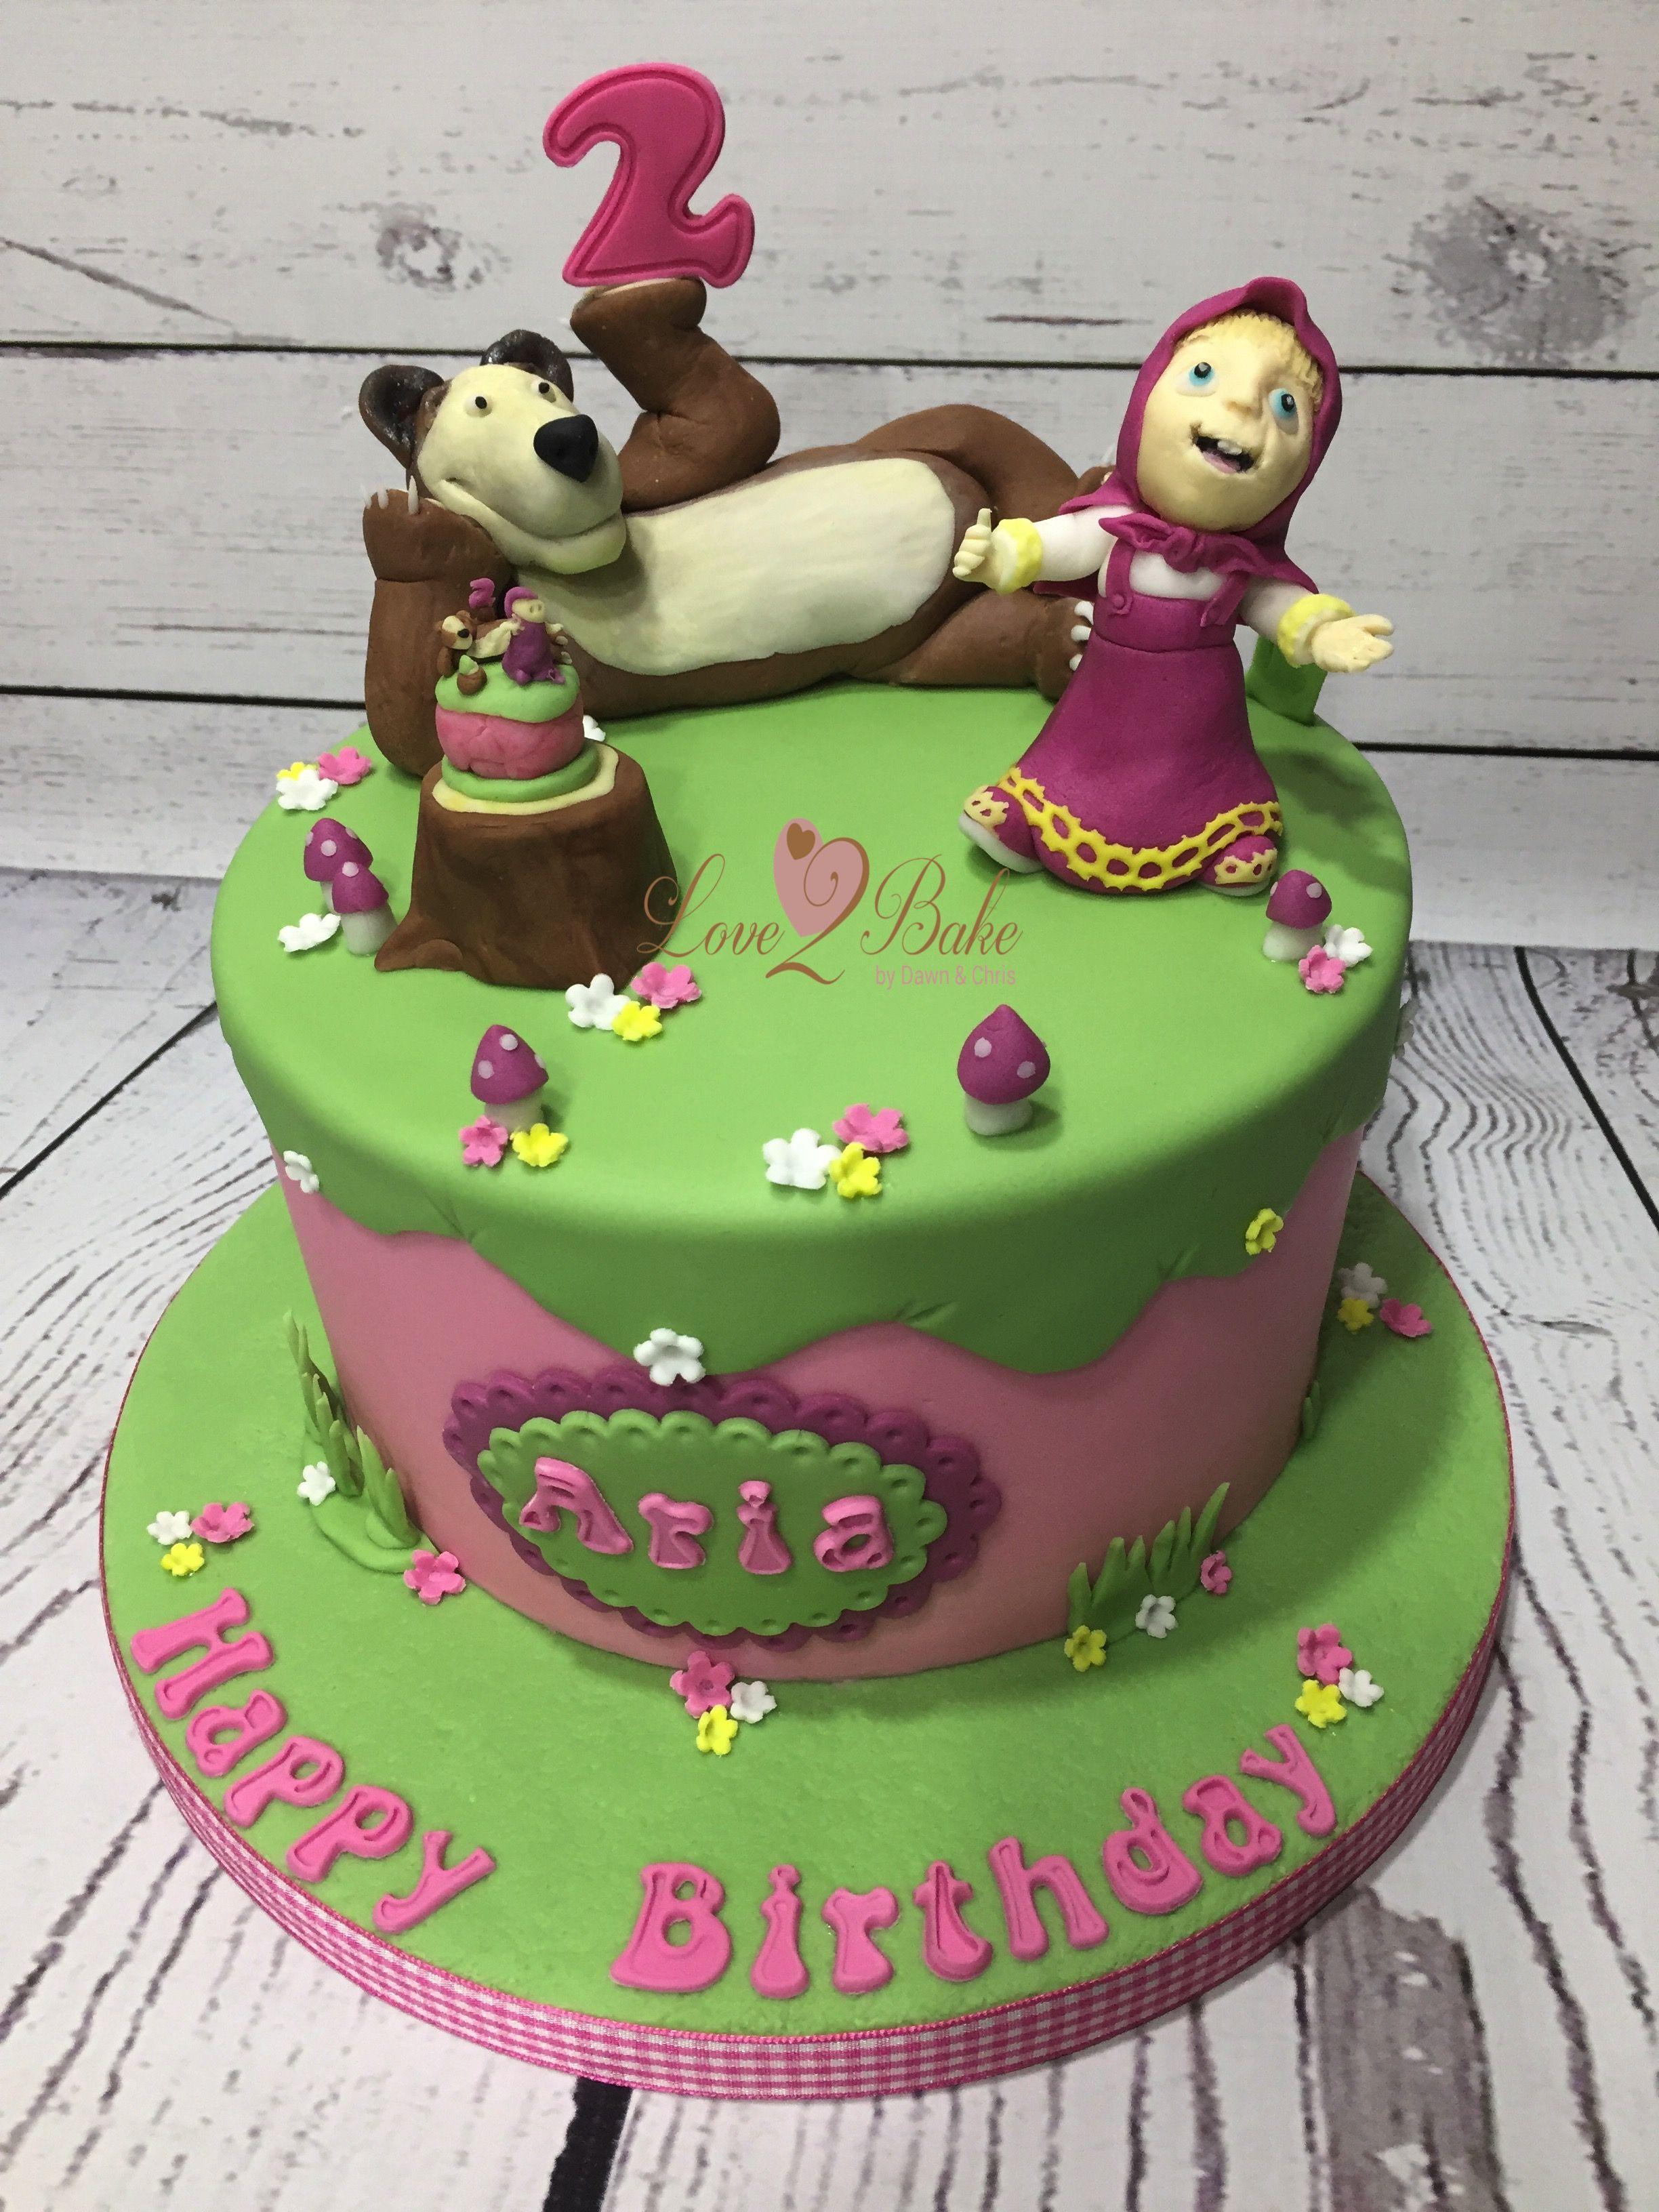 Masha And Bear Cake By Love2bake Oct 2017 Love2bake Cakes